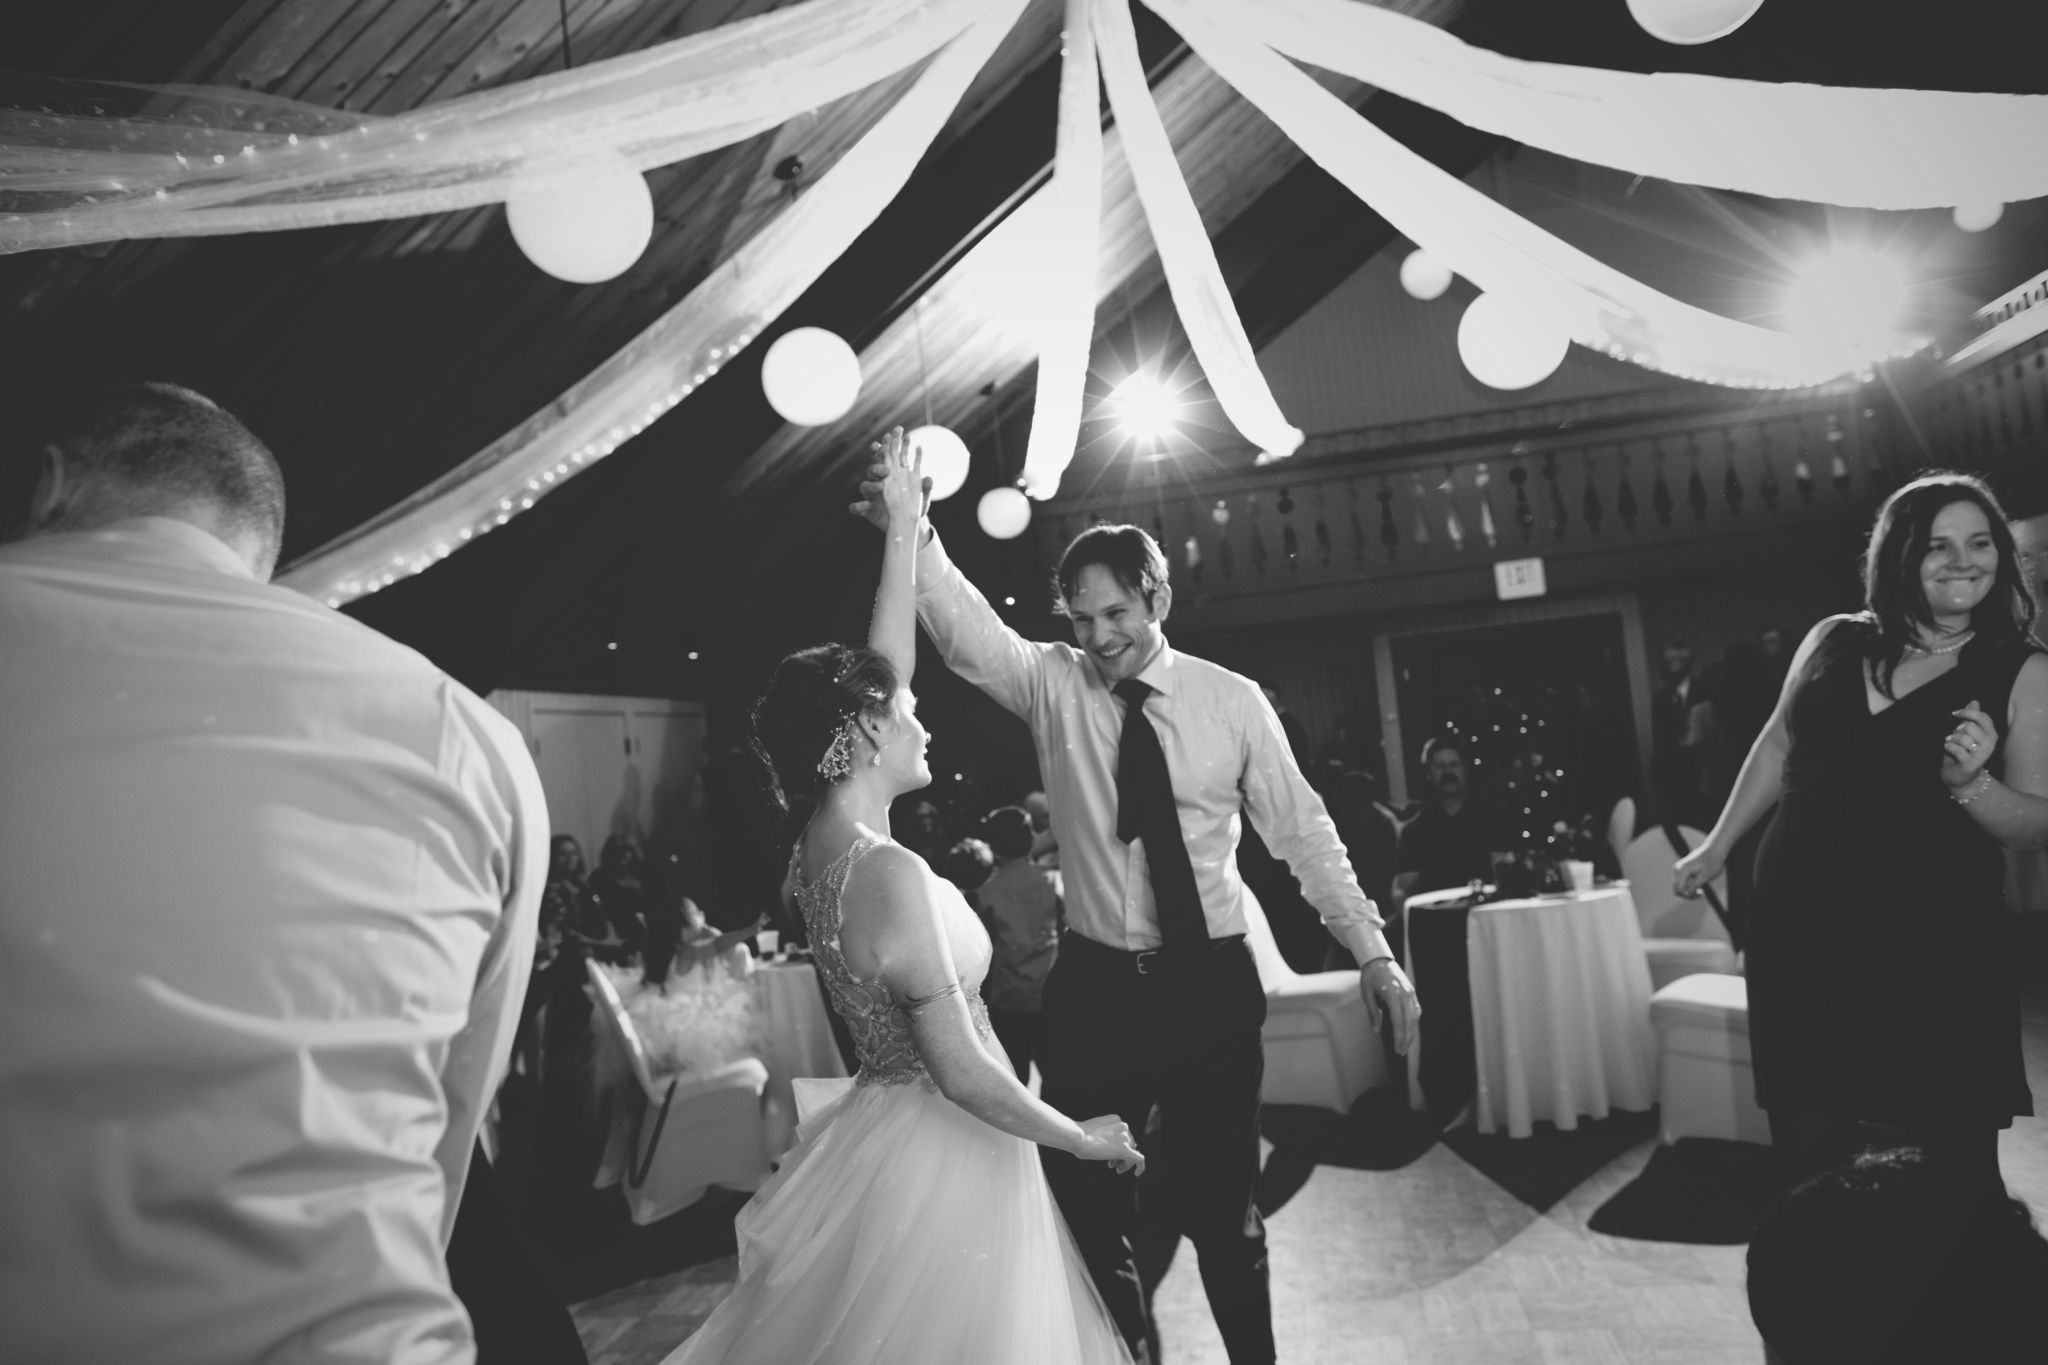 Wedding dress boxing  aimrcg  Powered By Box  wedding stuff  Pinterest  Wedding